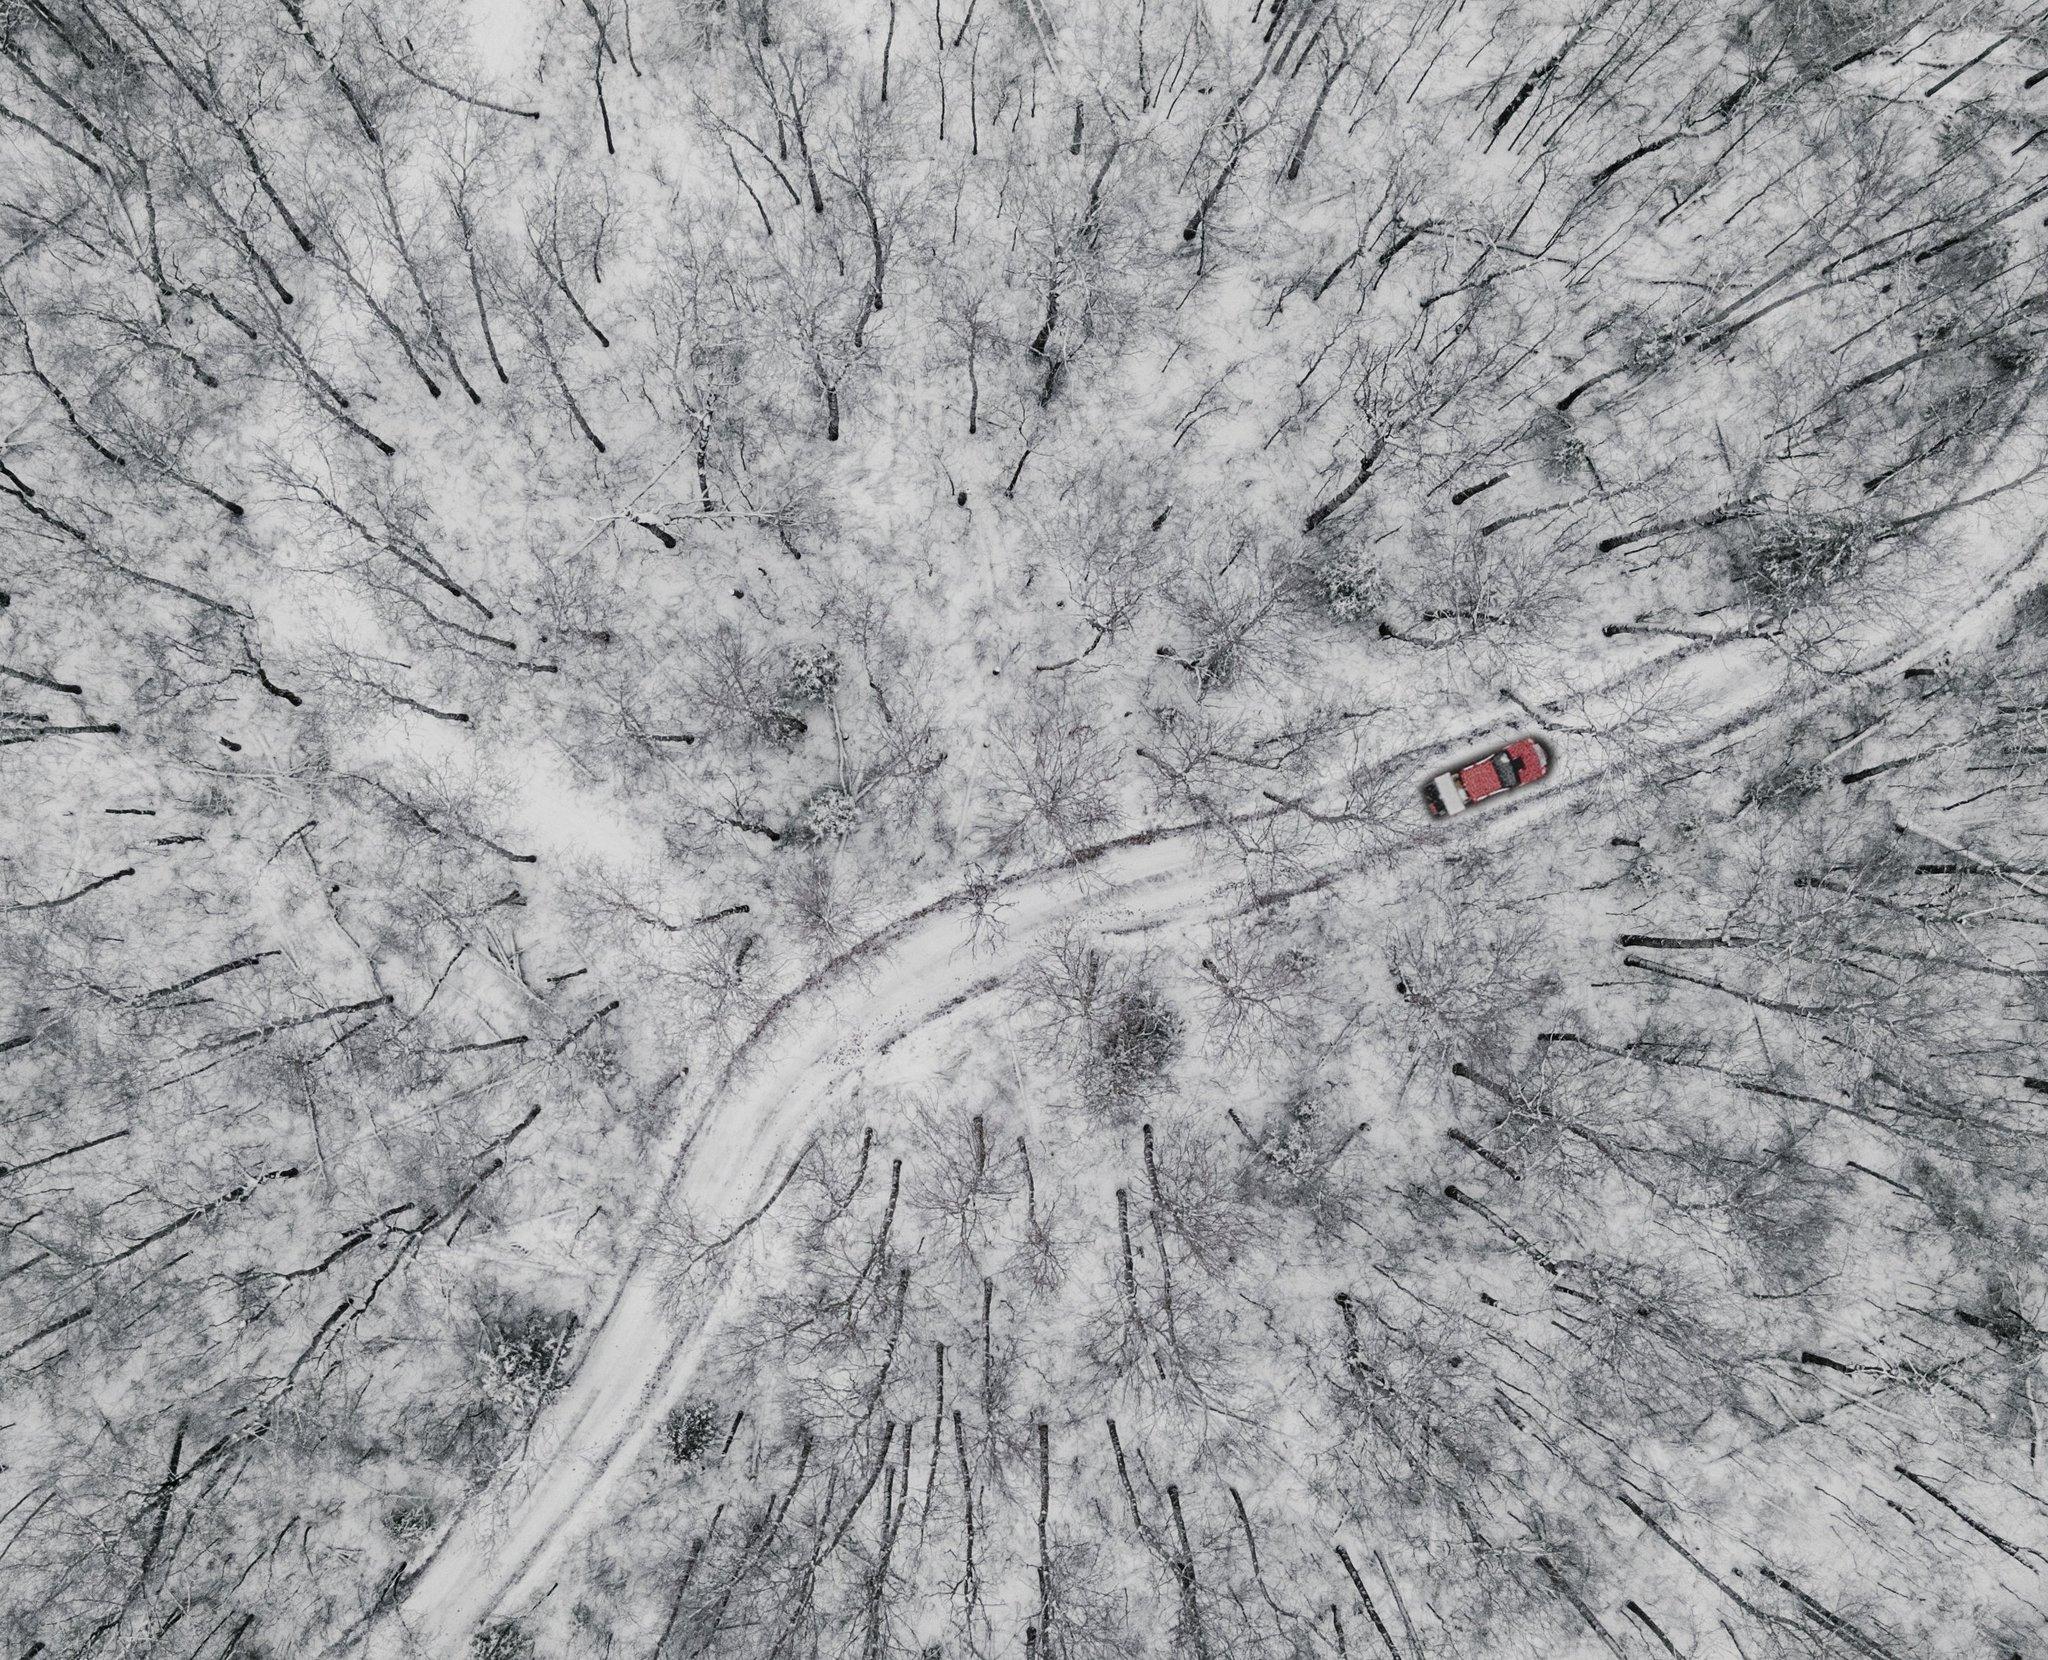 drone_photography_9.jpg